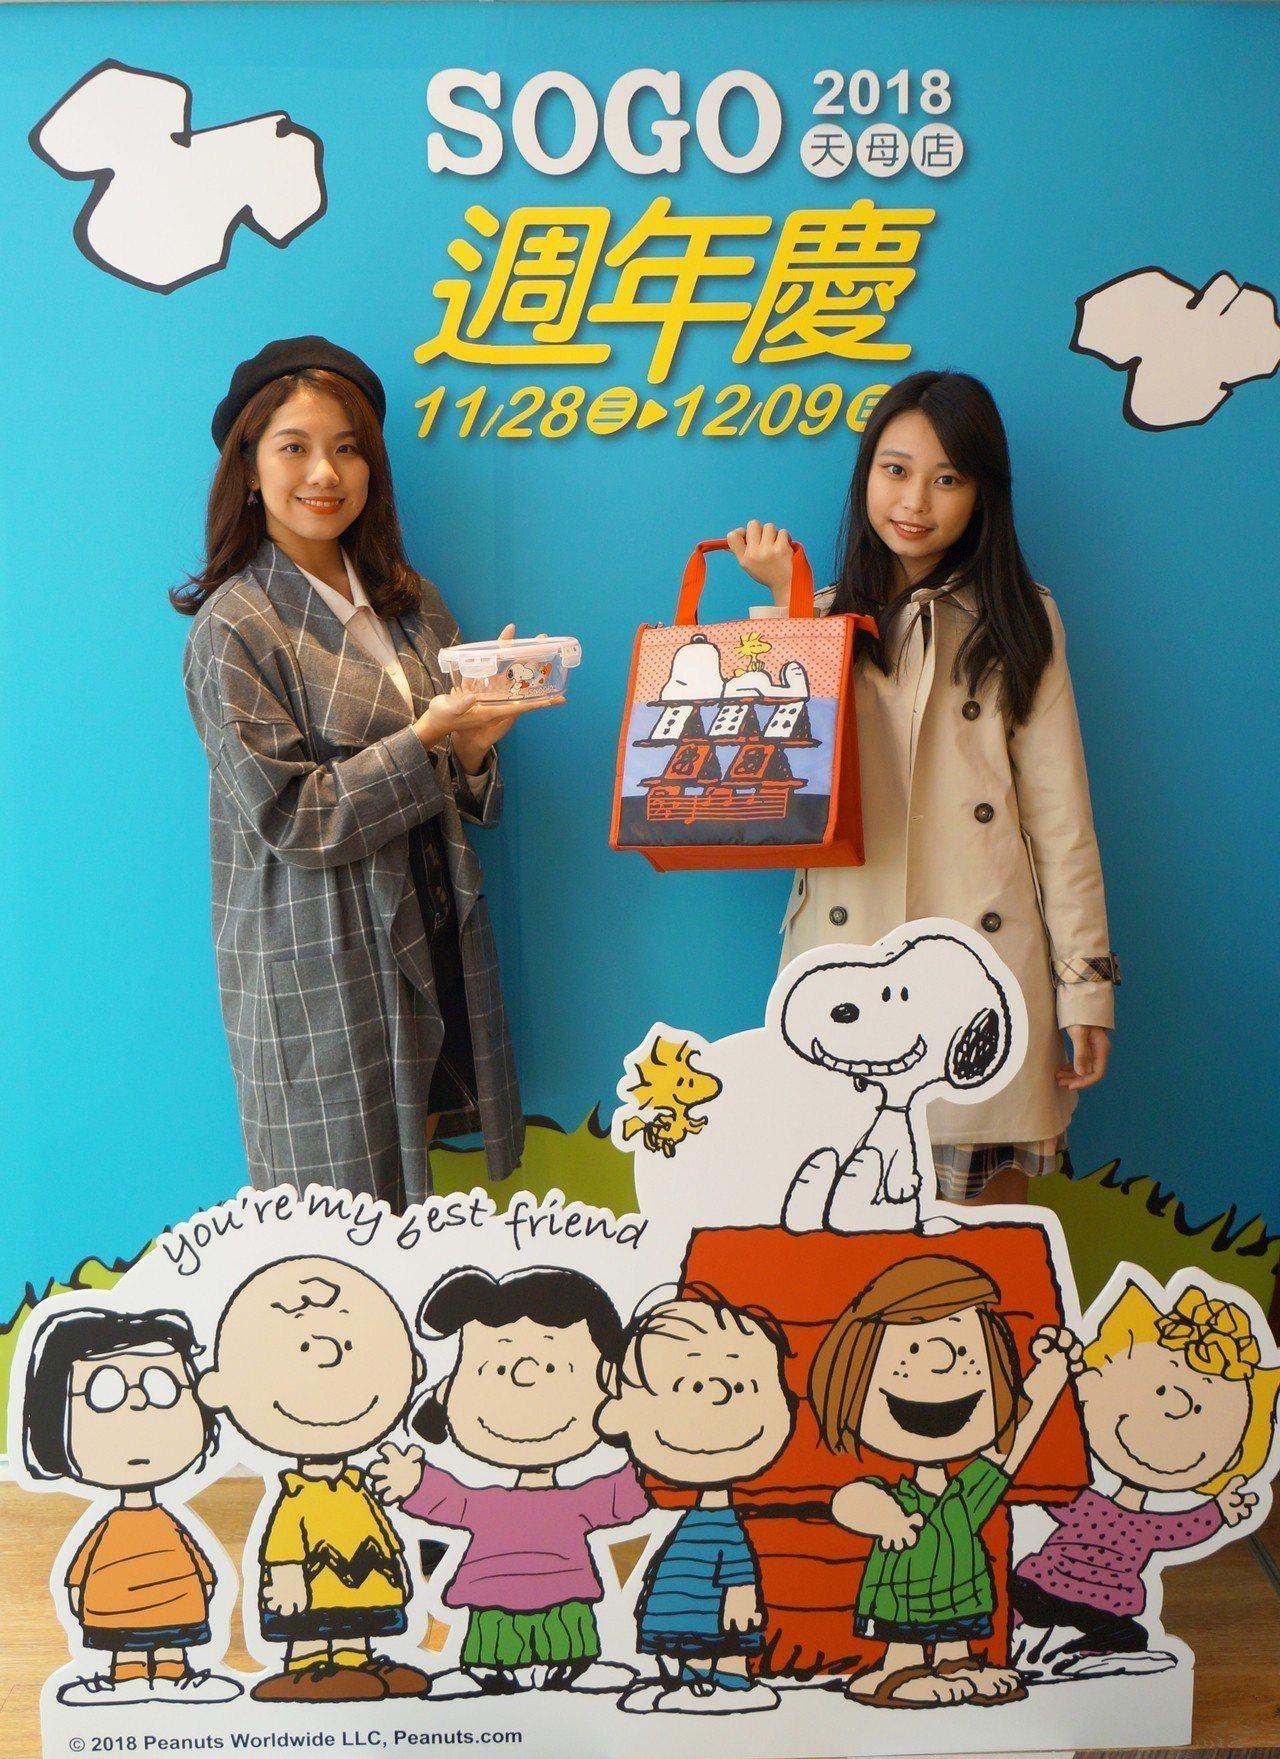 SOGO百貨天母店周年慶11月28日開打。圖/SOGO百貨提供